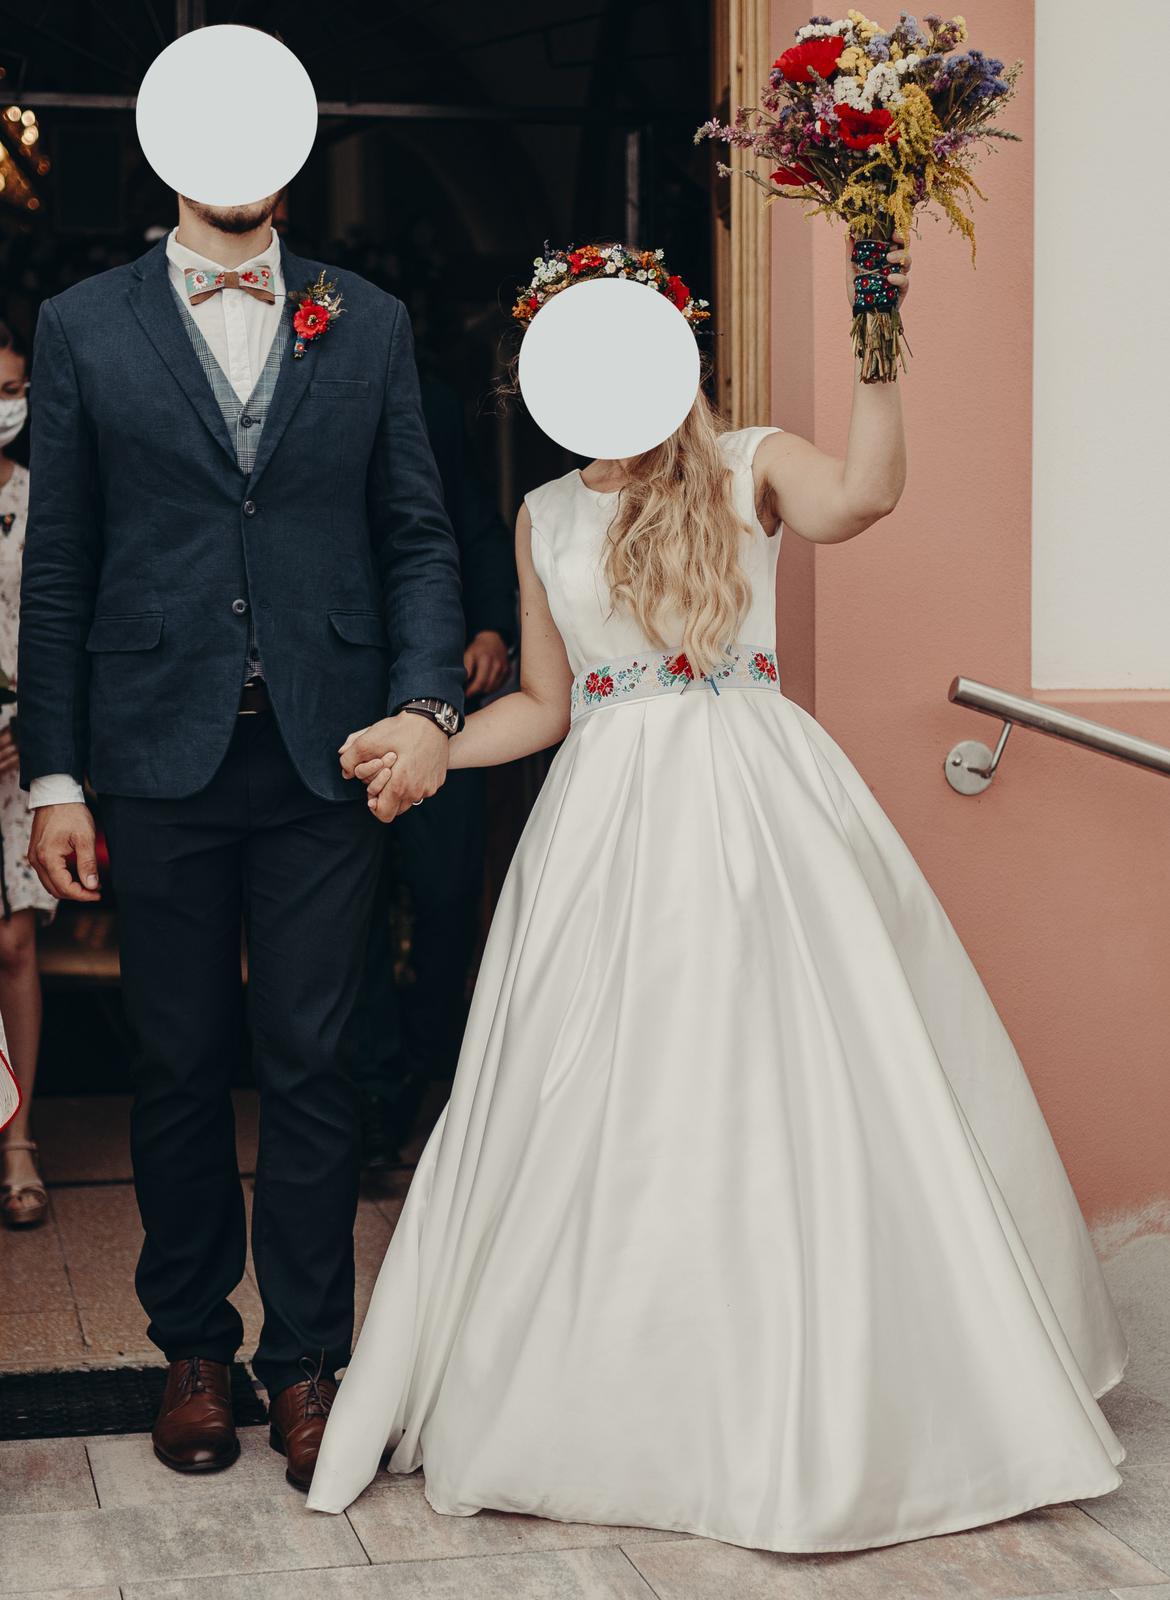 Jednoduche svadobne saty 36 - Obrázok č. 4